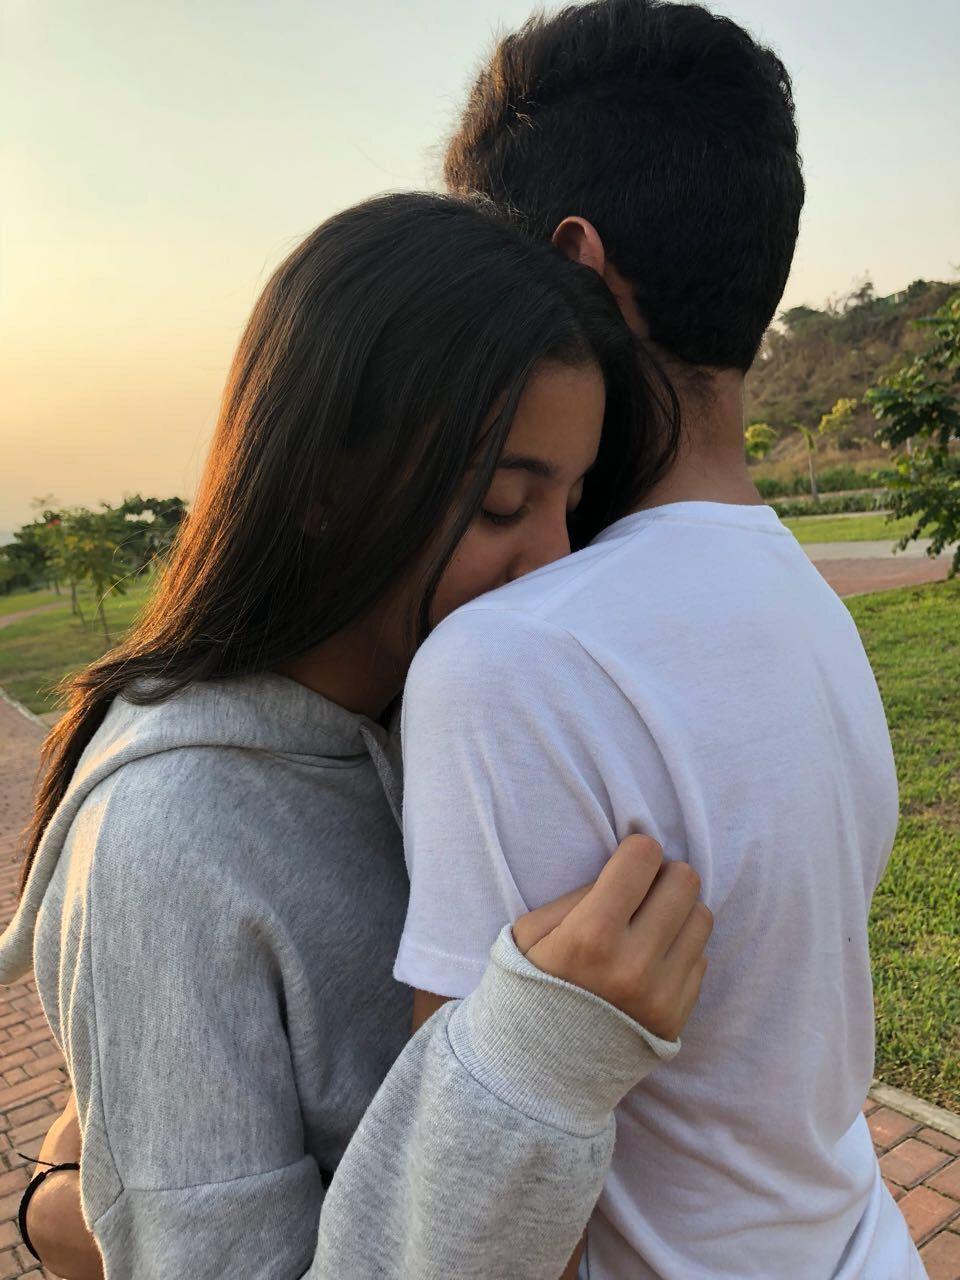 4 20 17 Love Cute Couple Pictures Cute Couples Goals